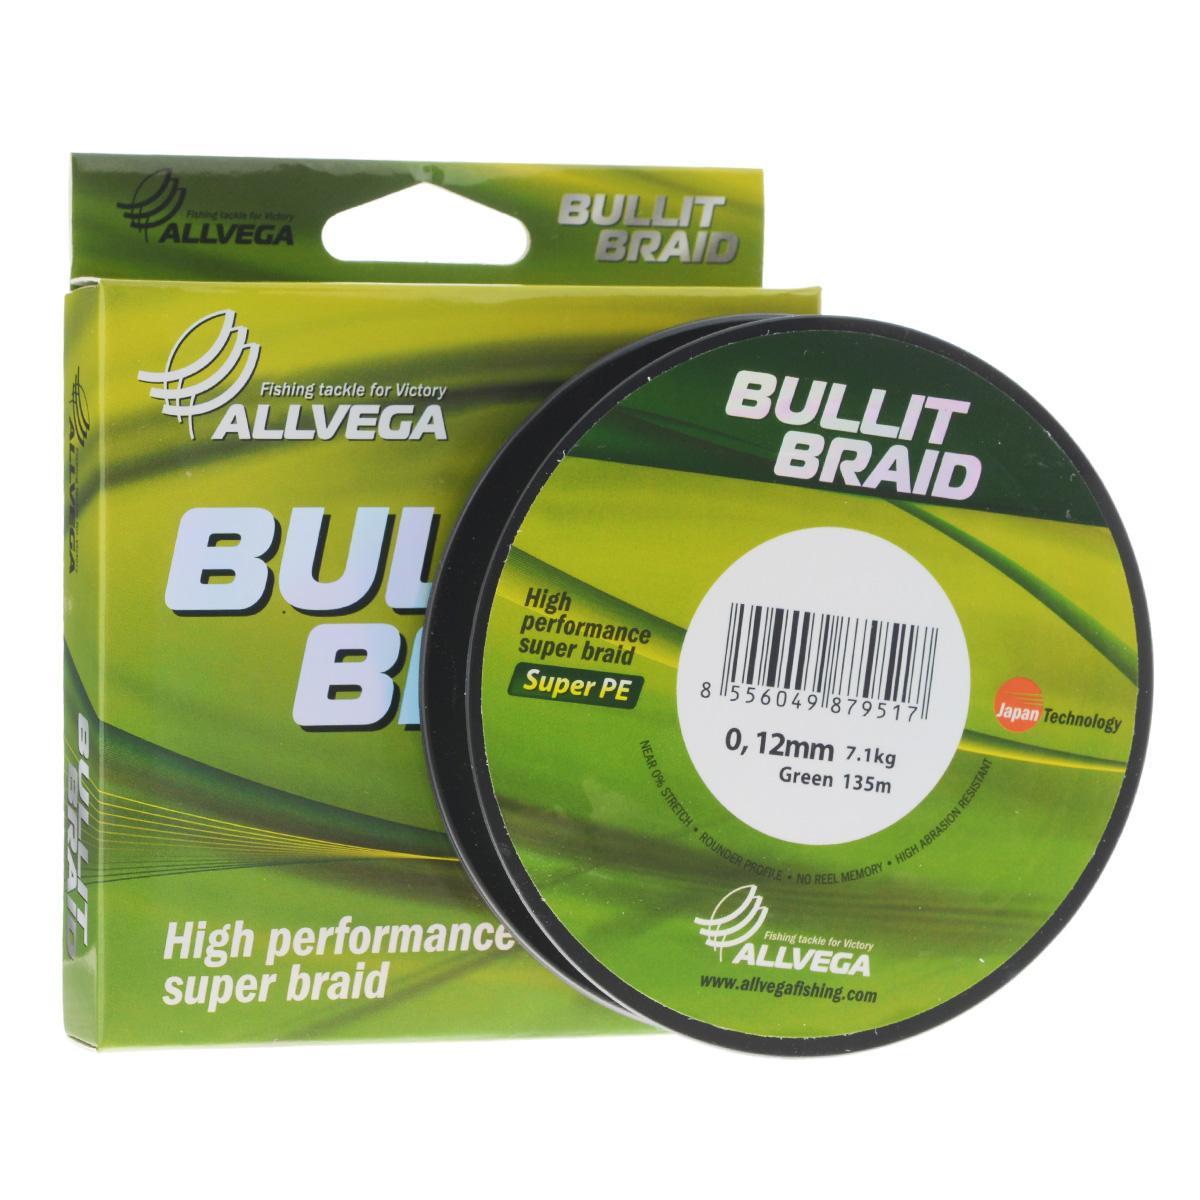 Леска плетеная Allvega Bullit Braid, цвет: темно-зеленый, 135 м, 0,12 мм, 7,1 кг